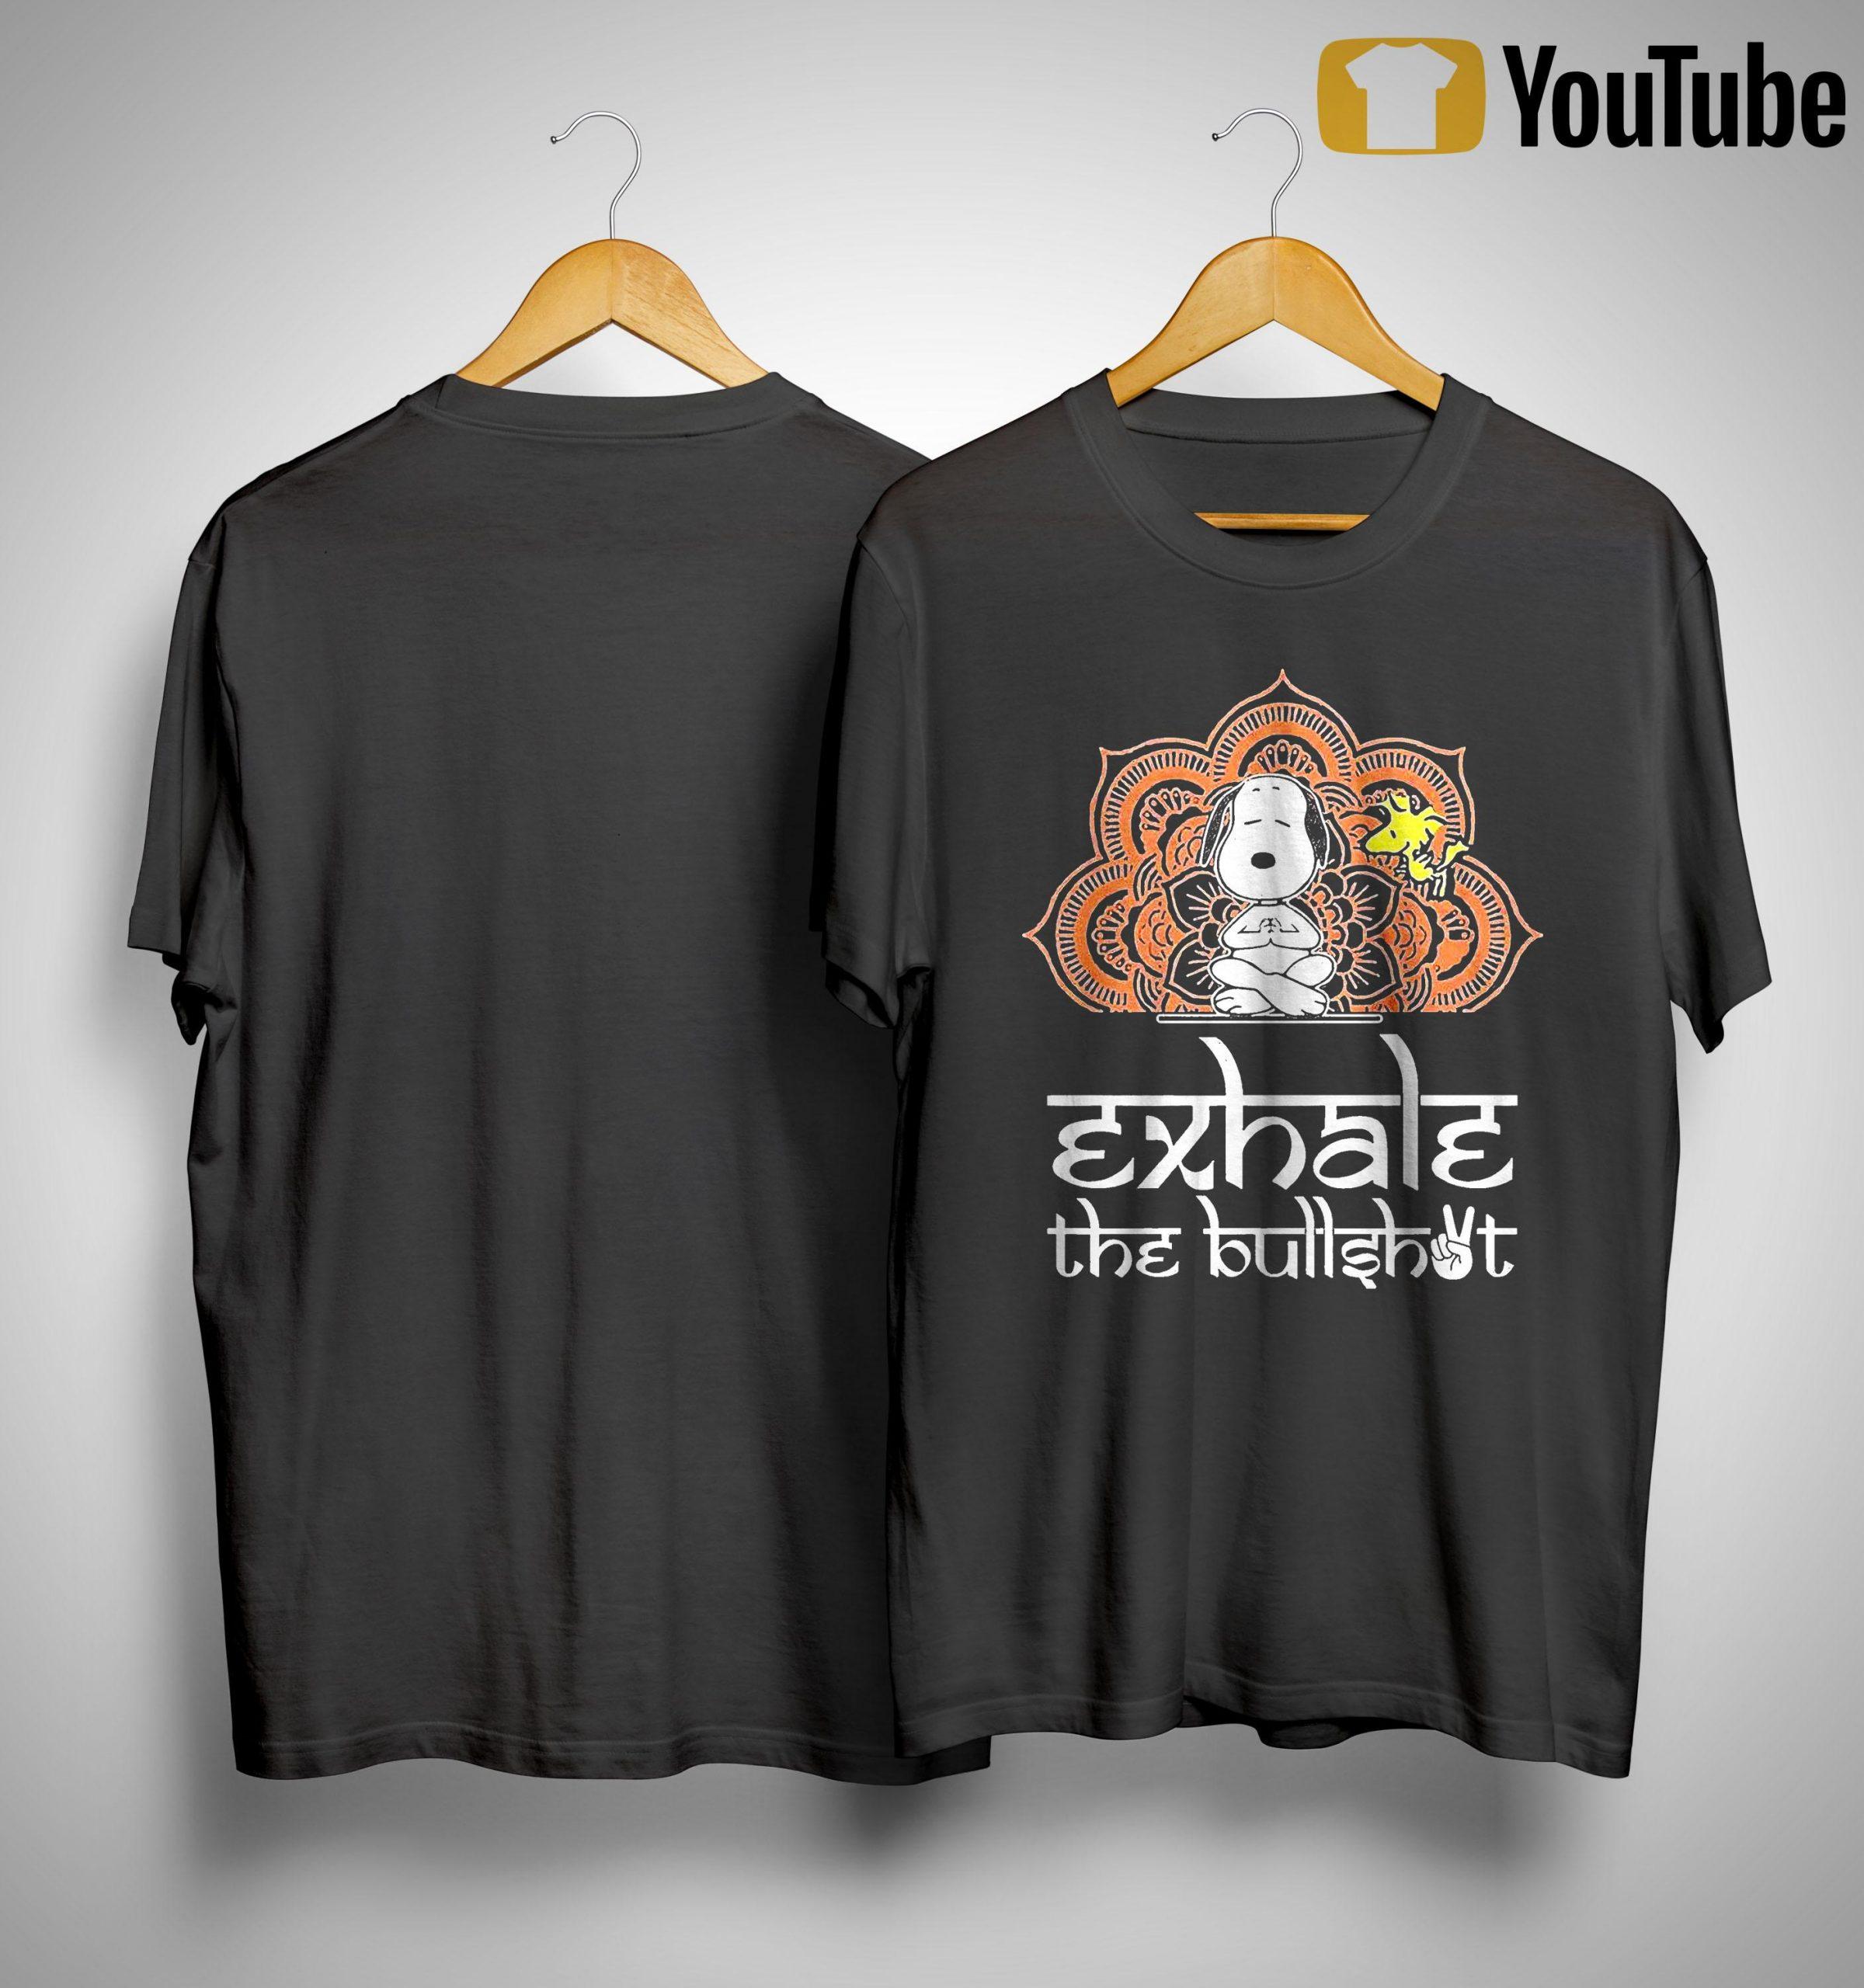 Yoga Snoopy And Woodstock Exhale The Bullshot Shirt